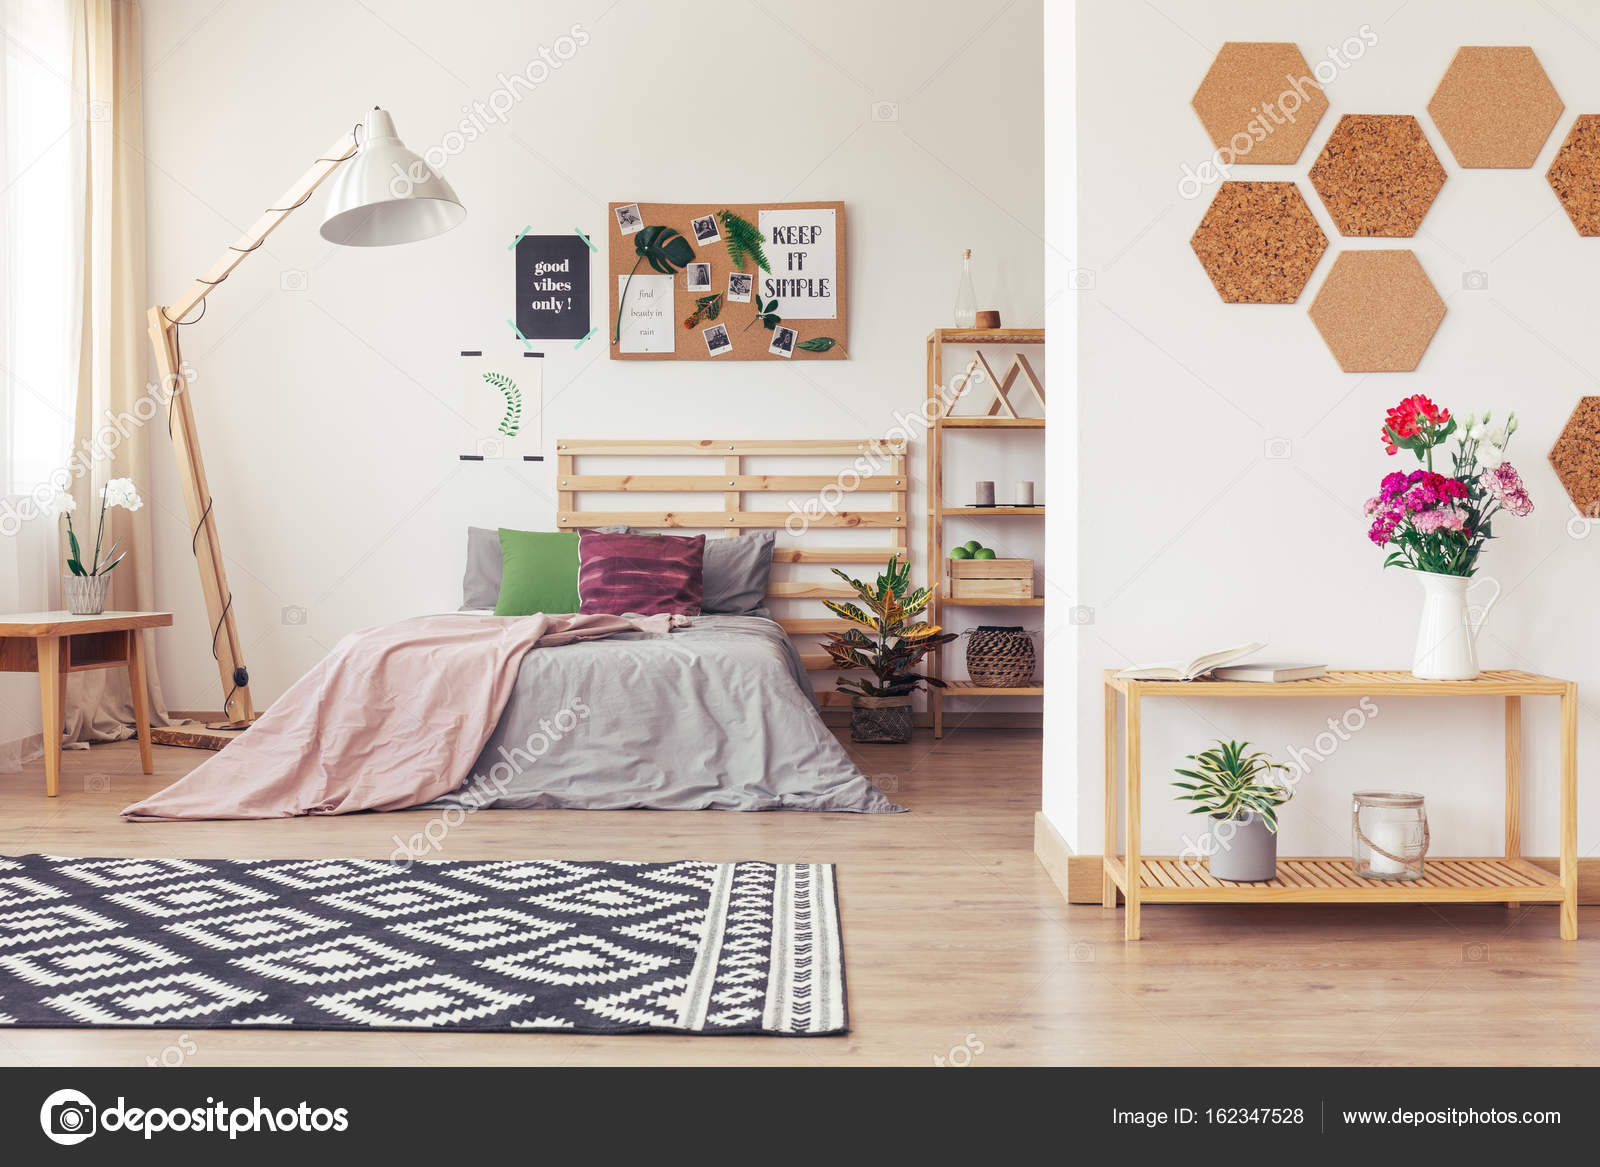 Apartment mit botanischen Innendesign — Stockfoto © photographee.eu ...